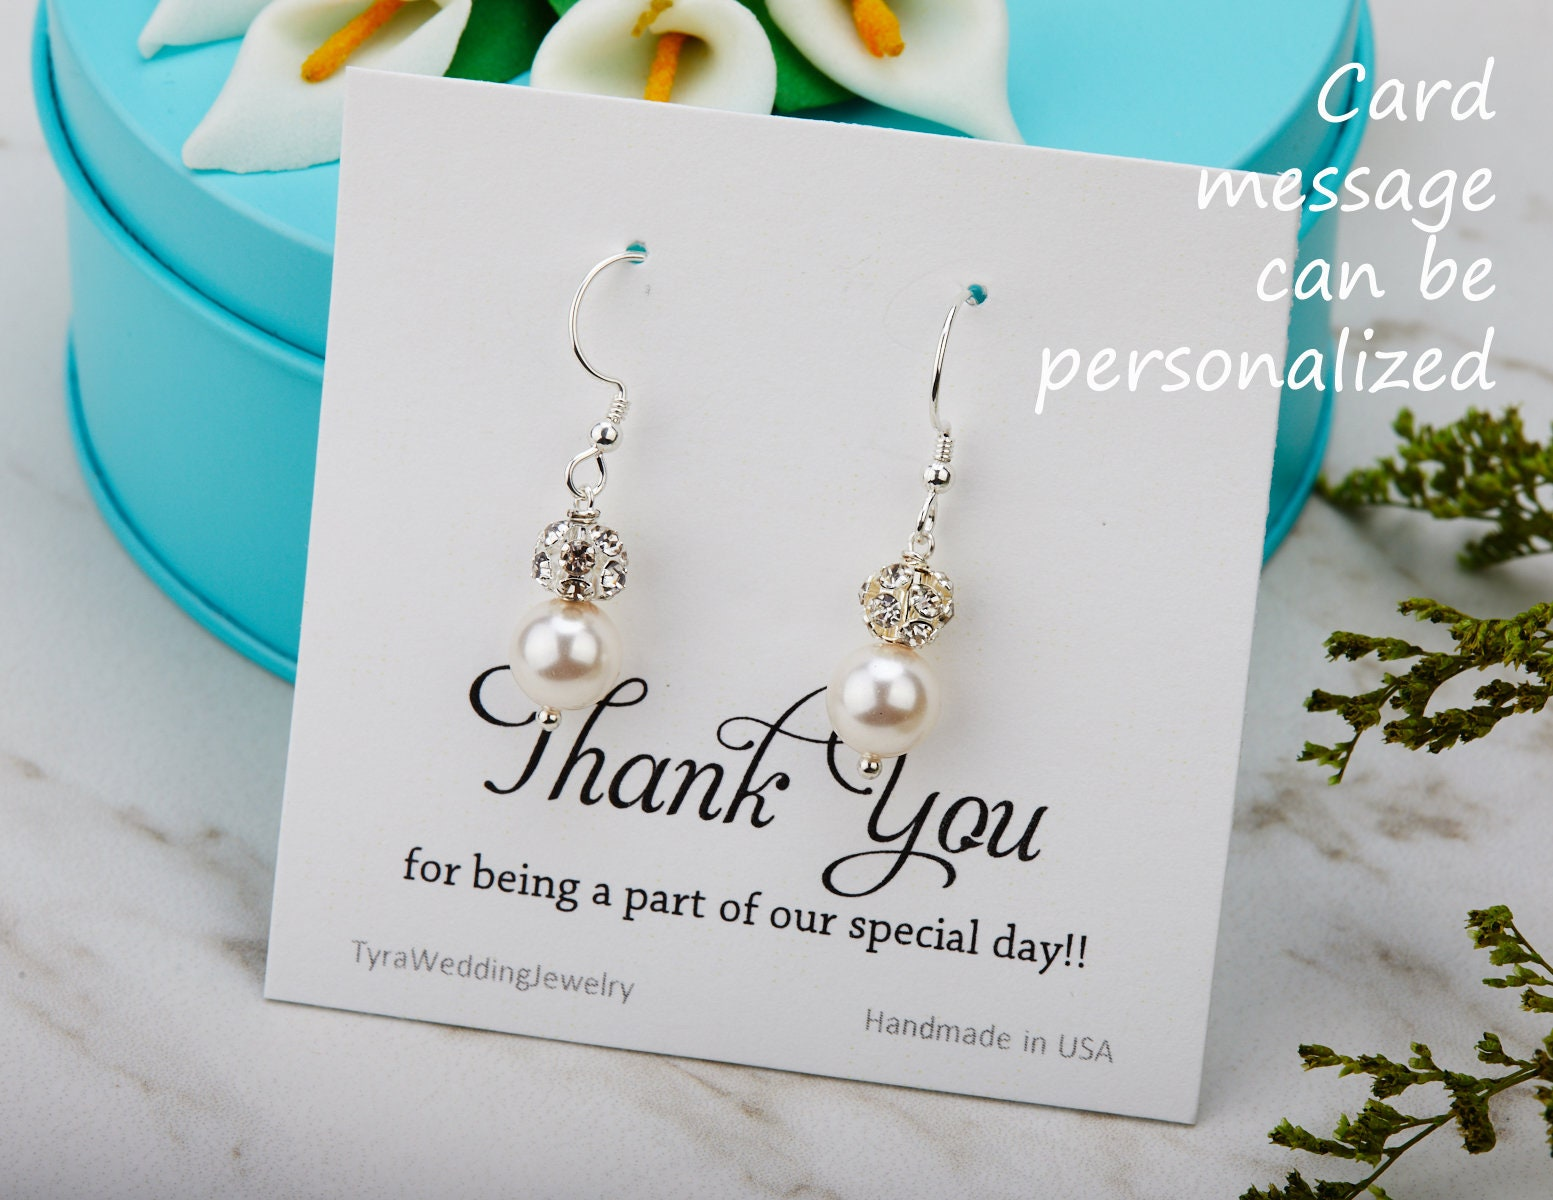 bridal earrings E2081G boho earrings elegant Serenity Pearl earrings Silver wedding earrings silver gold earrings two tone earrings